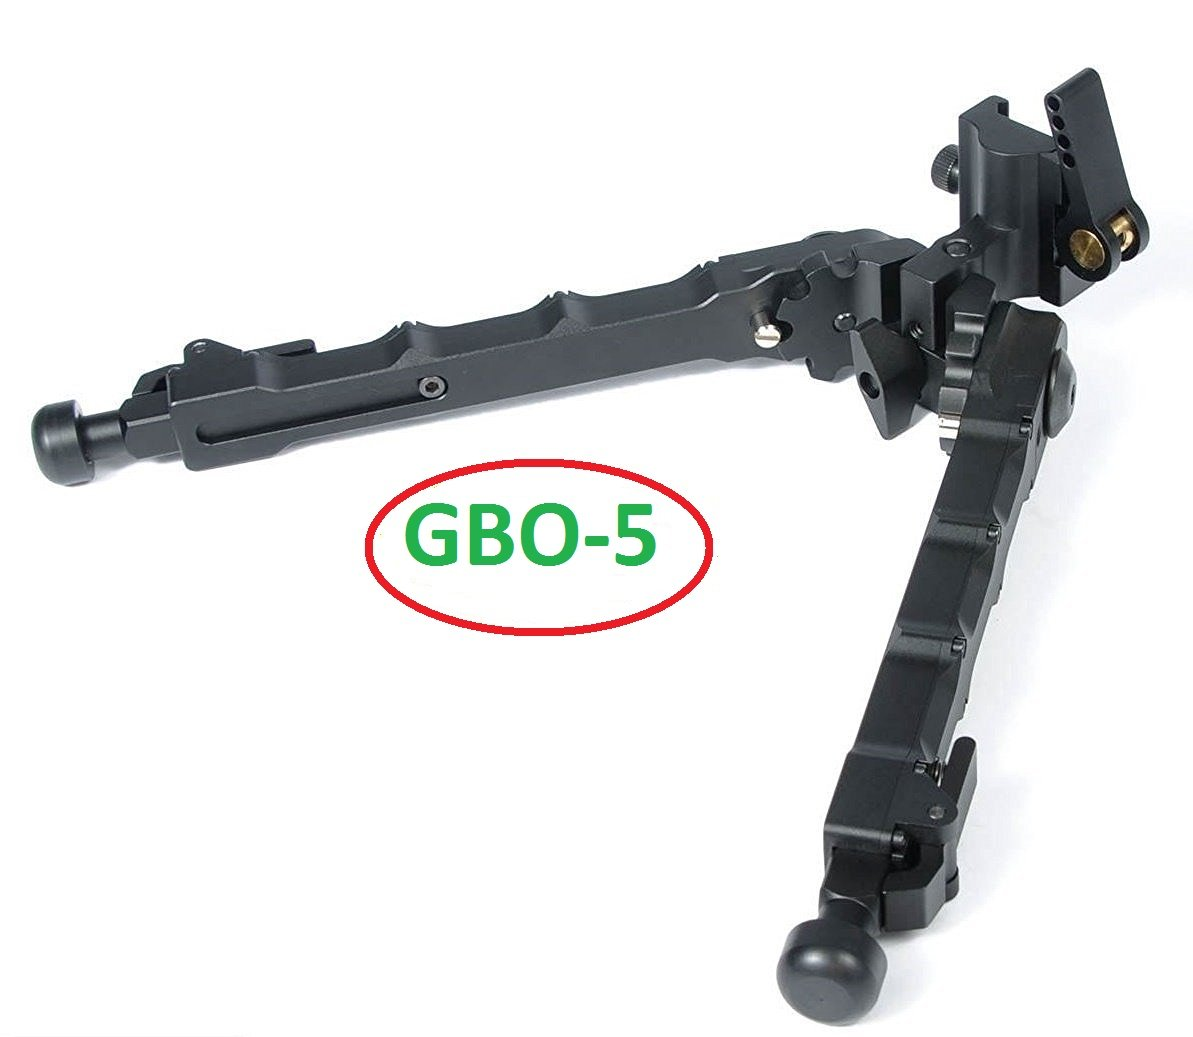 Green Blob Outdoors ( BLACK-GBO-5 ) QD Bipod Black Tactical Bipod 7.25 - 9 inches Flat Adjustable